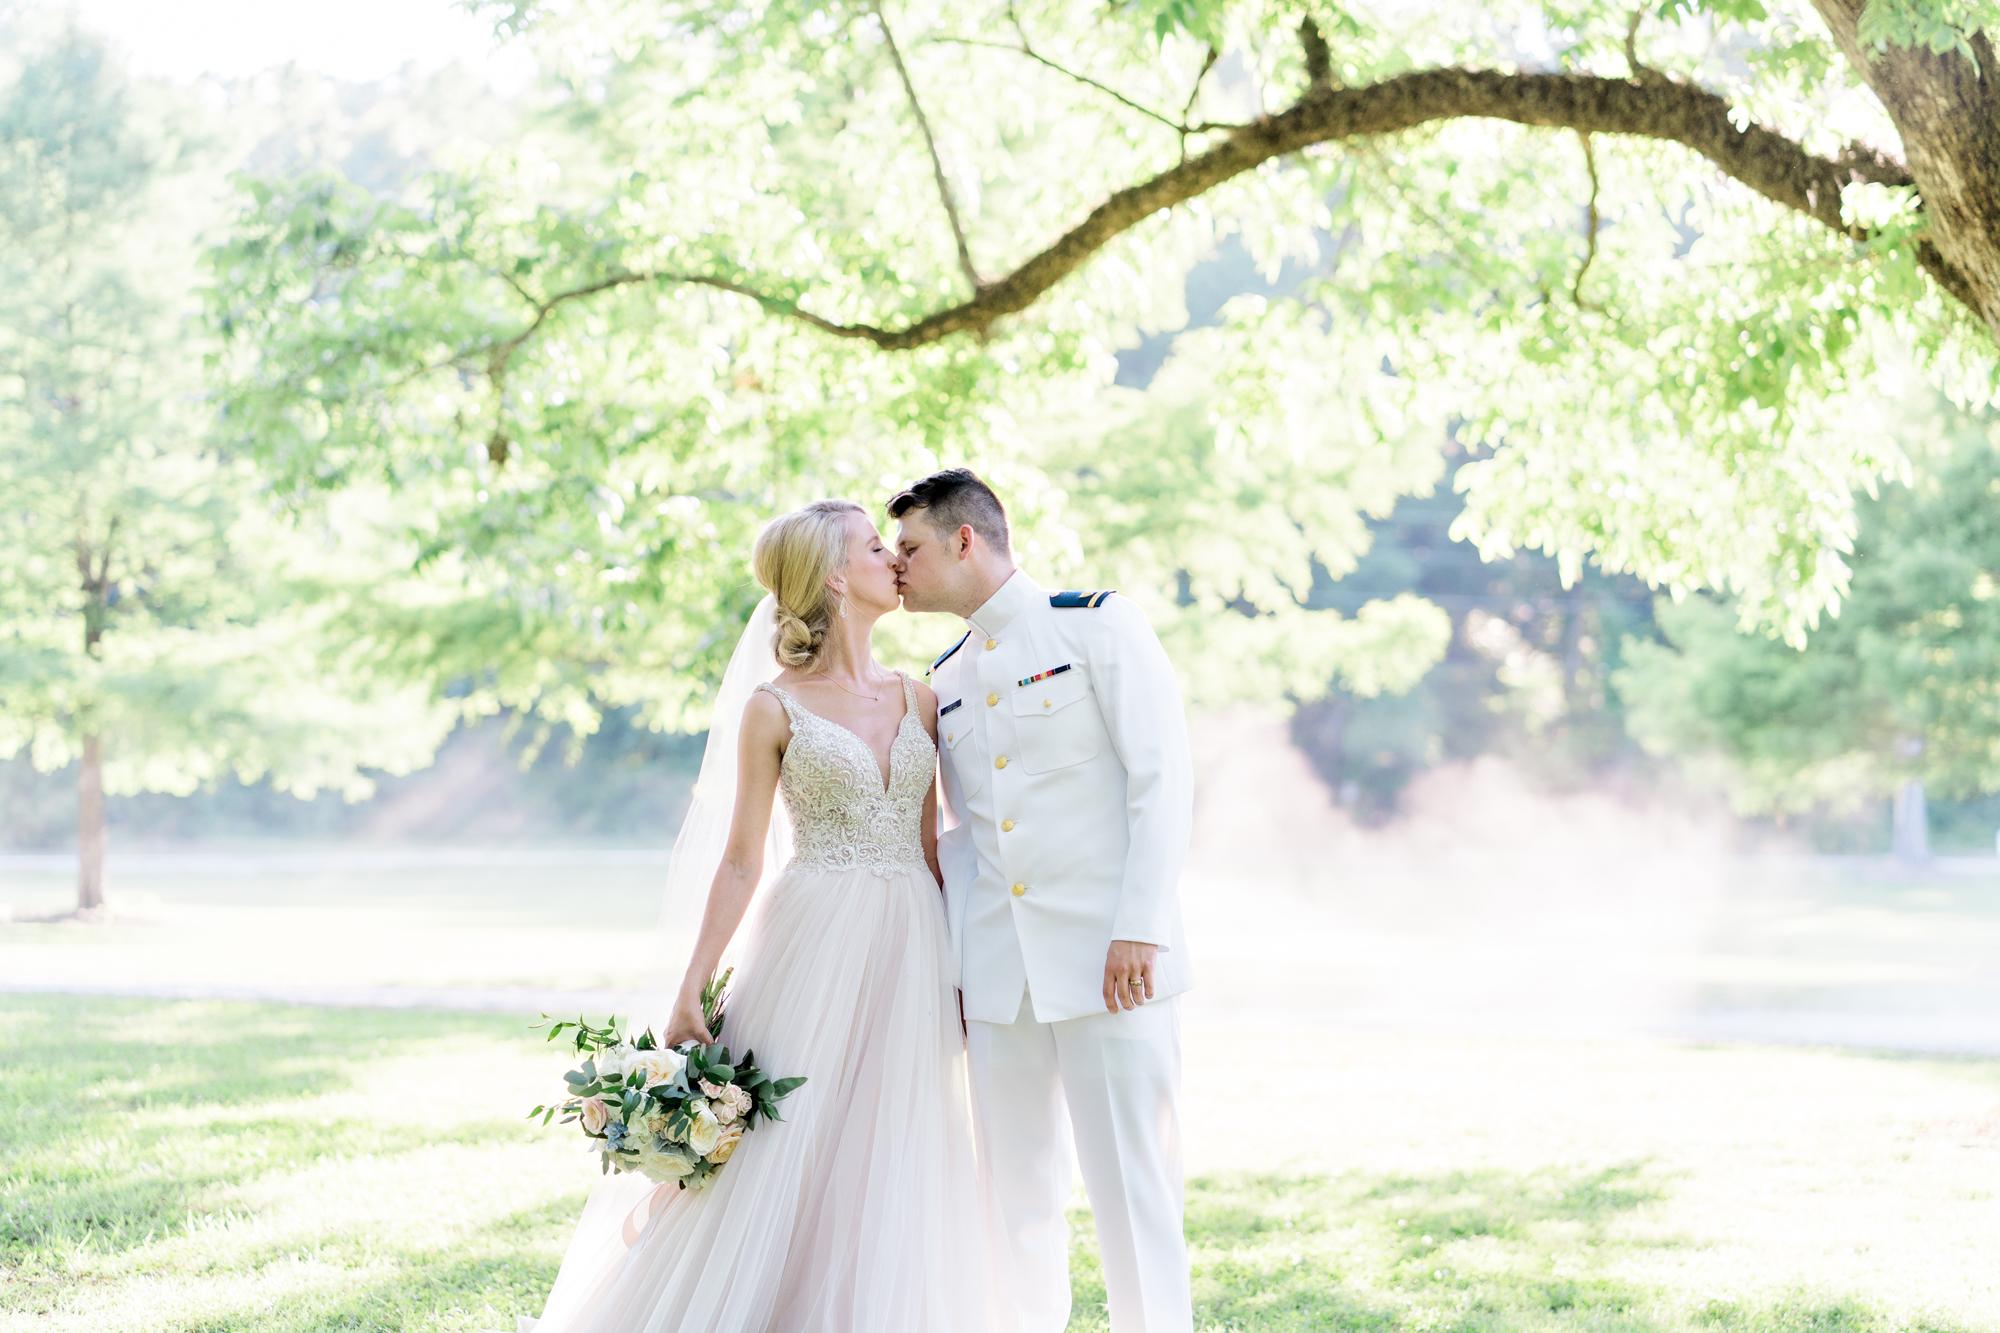 Alabama-Photographers-Nick-Drollette-Wedding-Photography-148.jpg